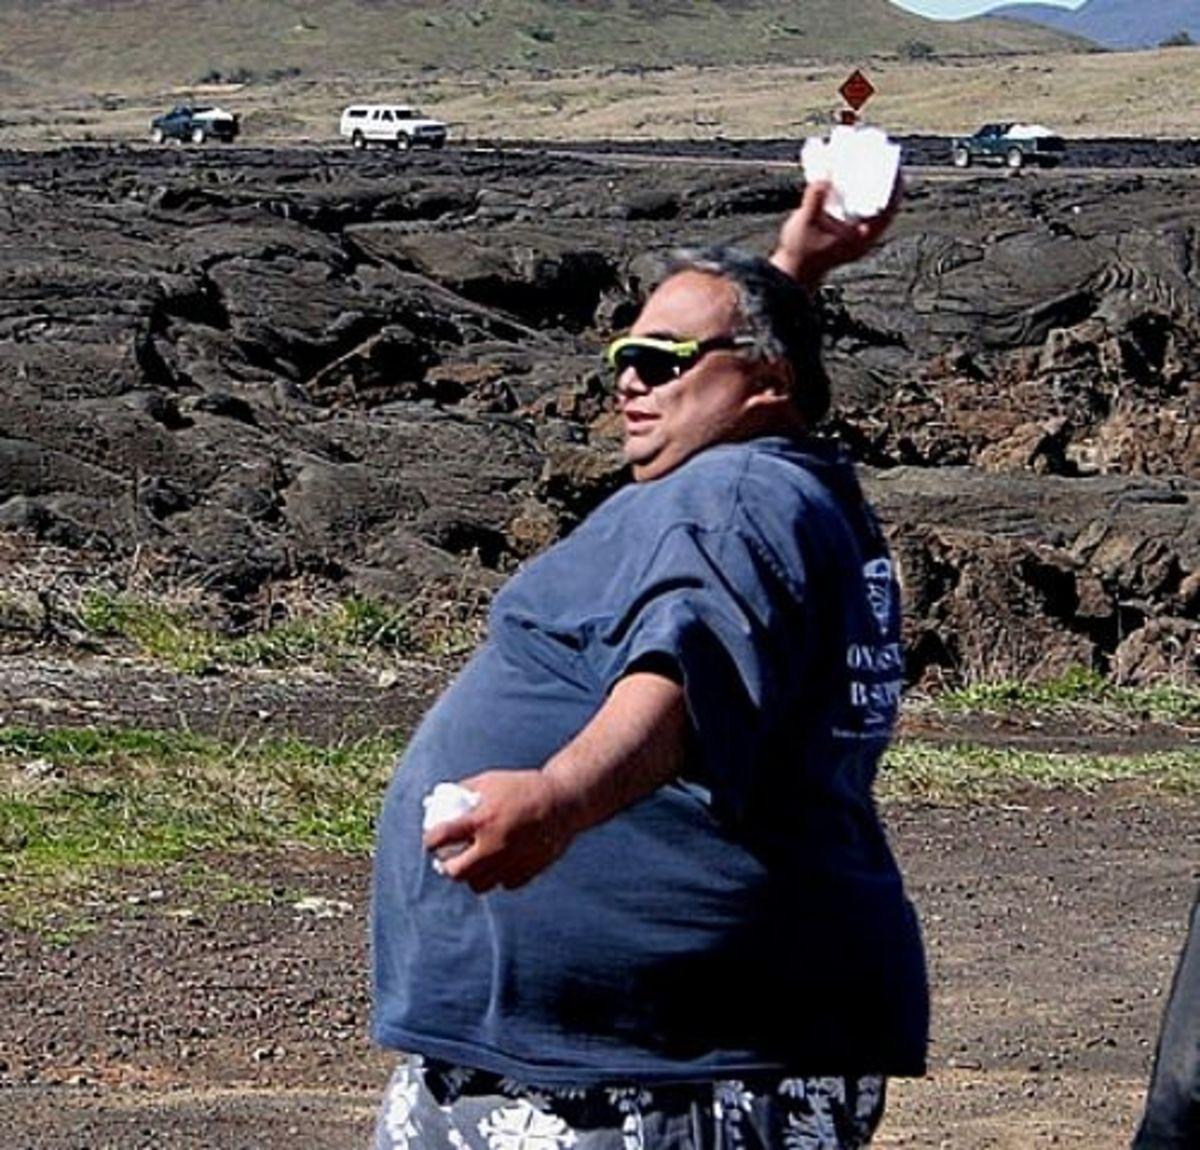 One Big Hawaiian Man Throwing a Snowball on the Beach